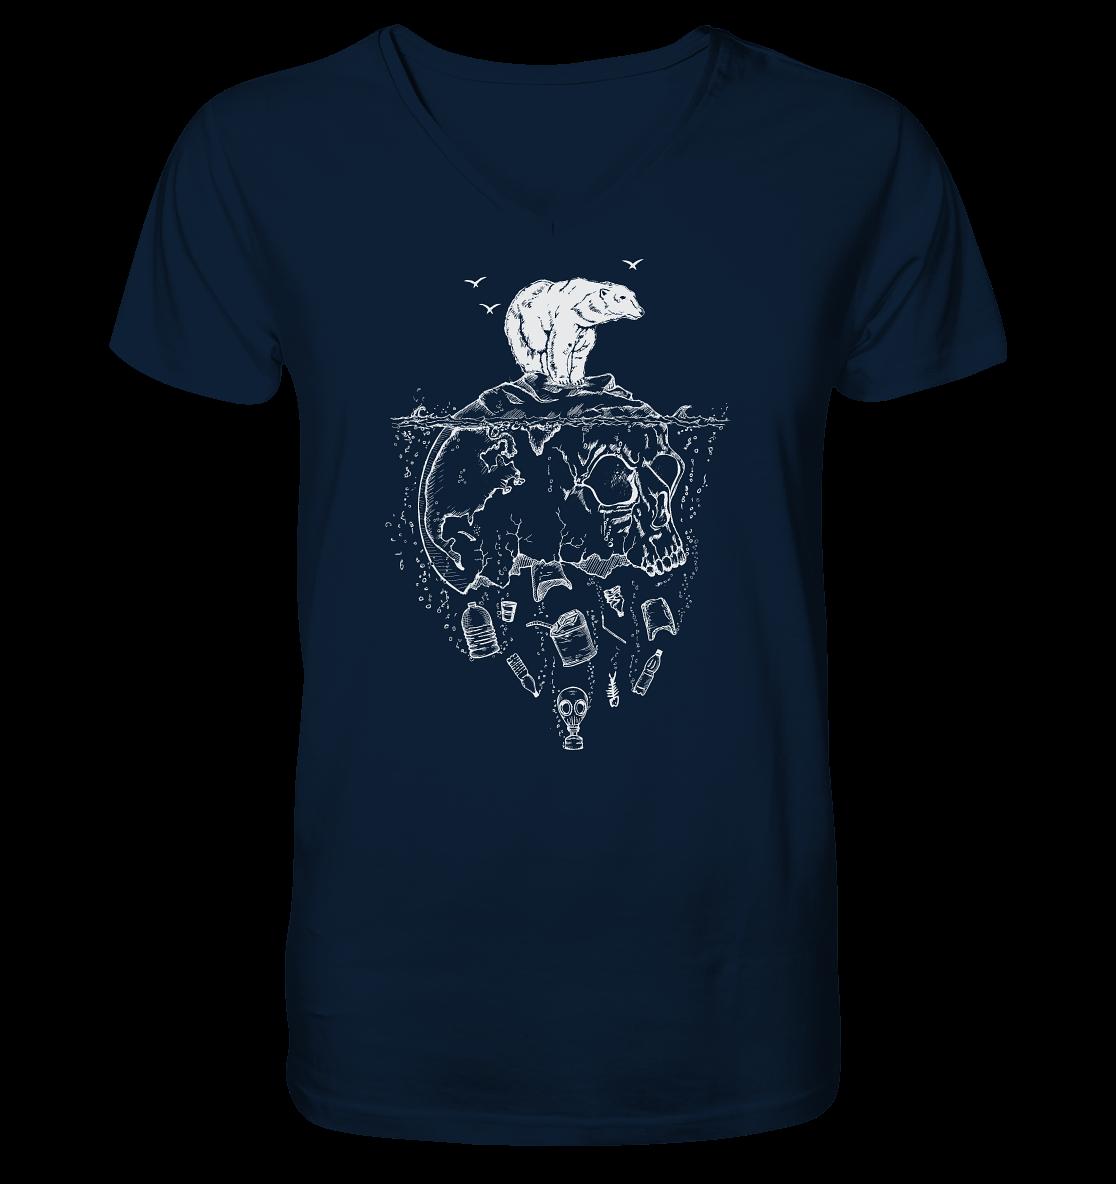 front-mens-organic-v-neck-shirt-0e2035-1116x-4.png